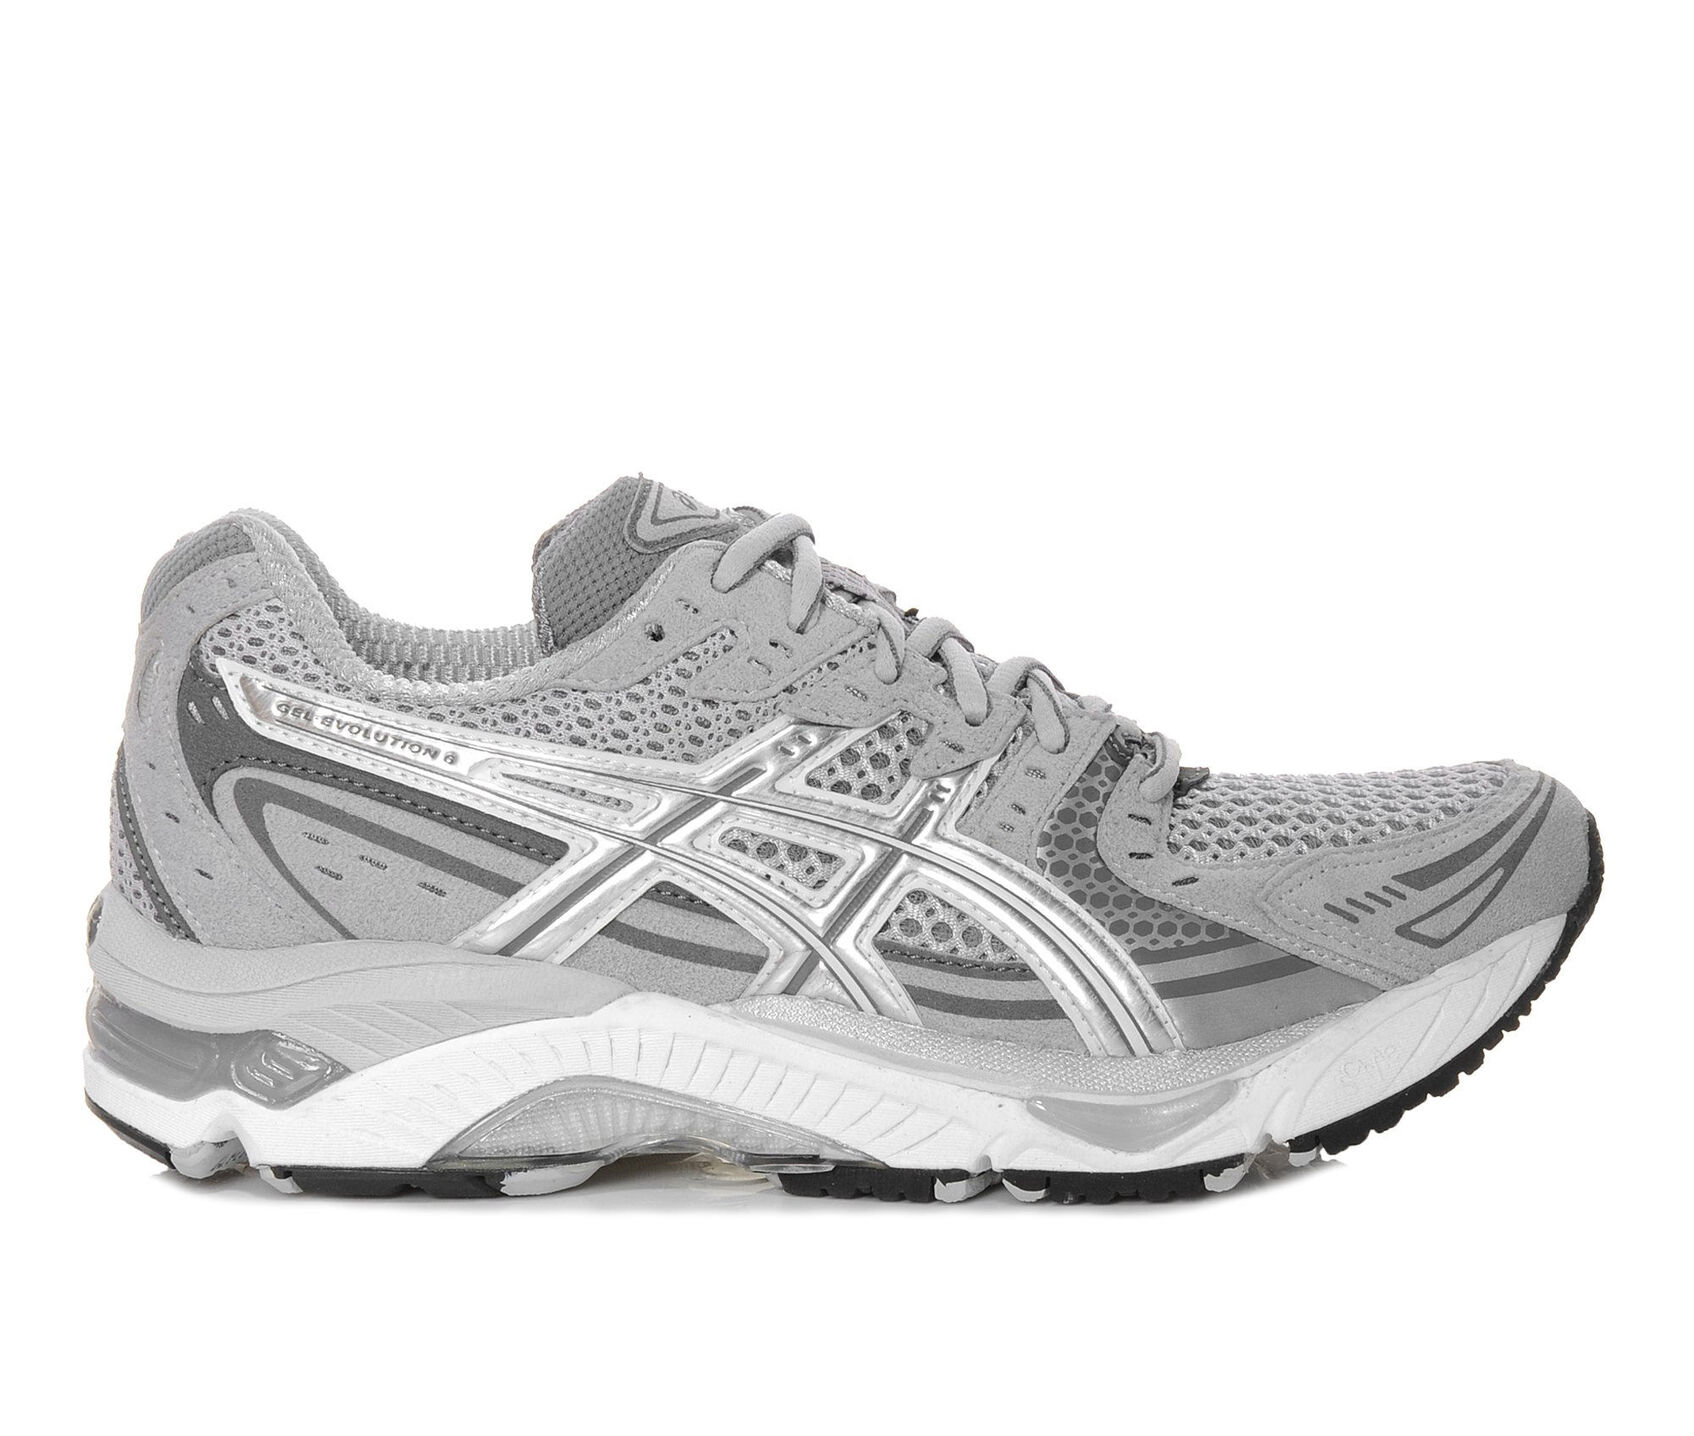 dccc2da756c Women's ASICS Gel Evolution 6 Running Shoes | Shoe Carnival